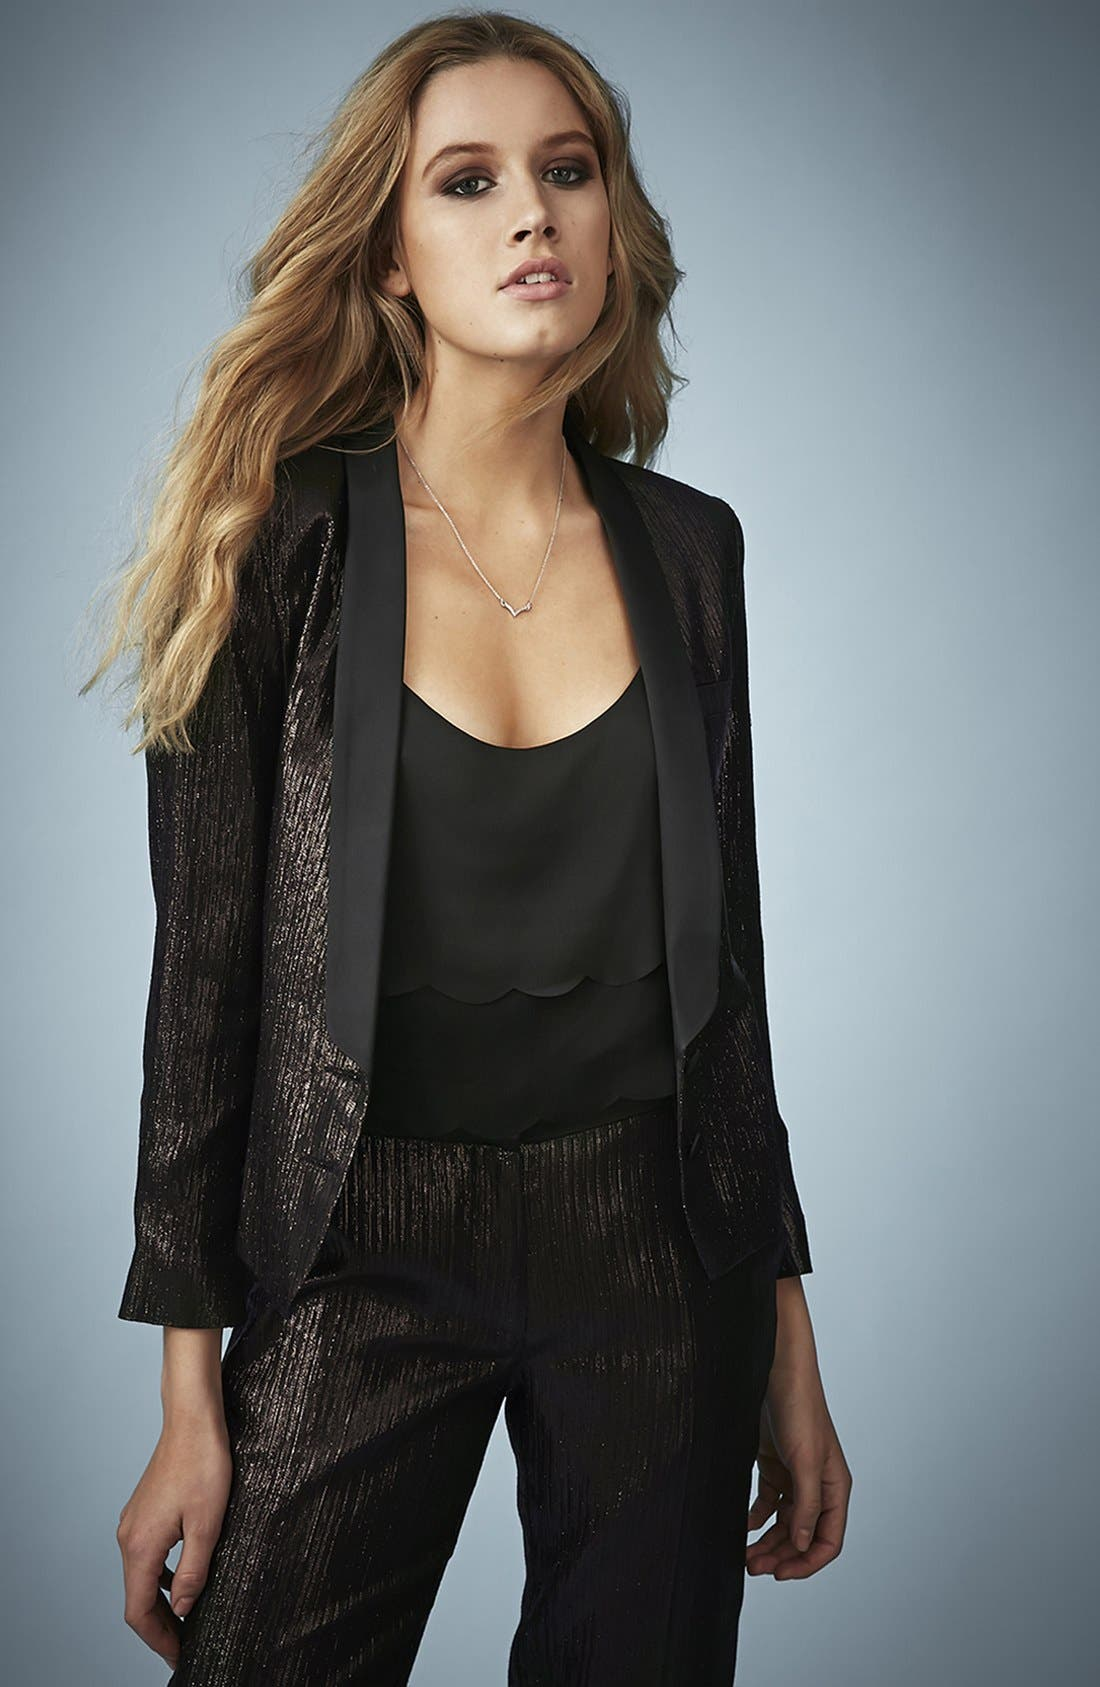 Main Image - Kate Moss for Topshop Lamé Tuxedo Jacket